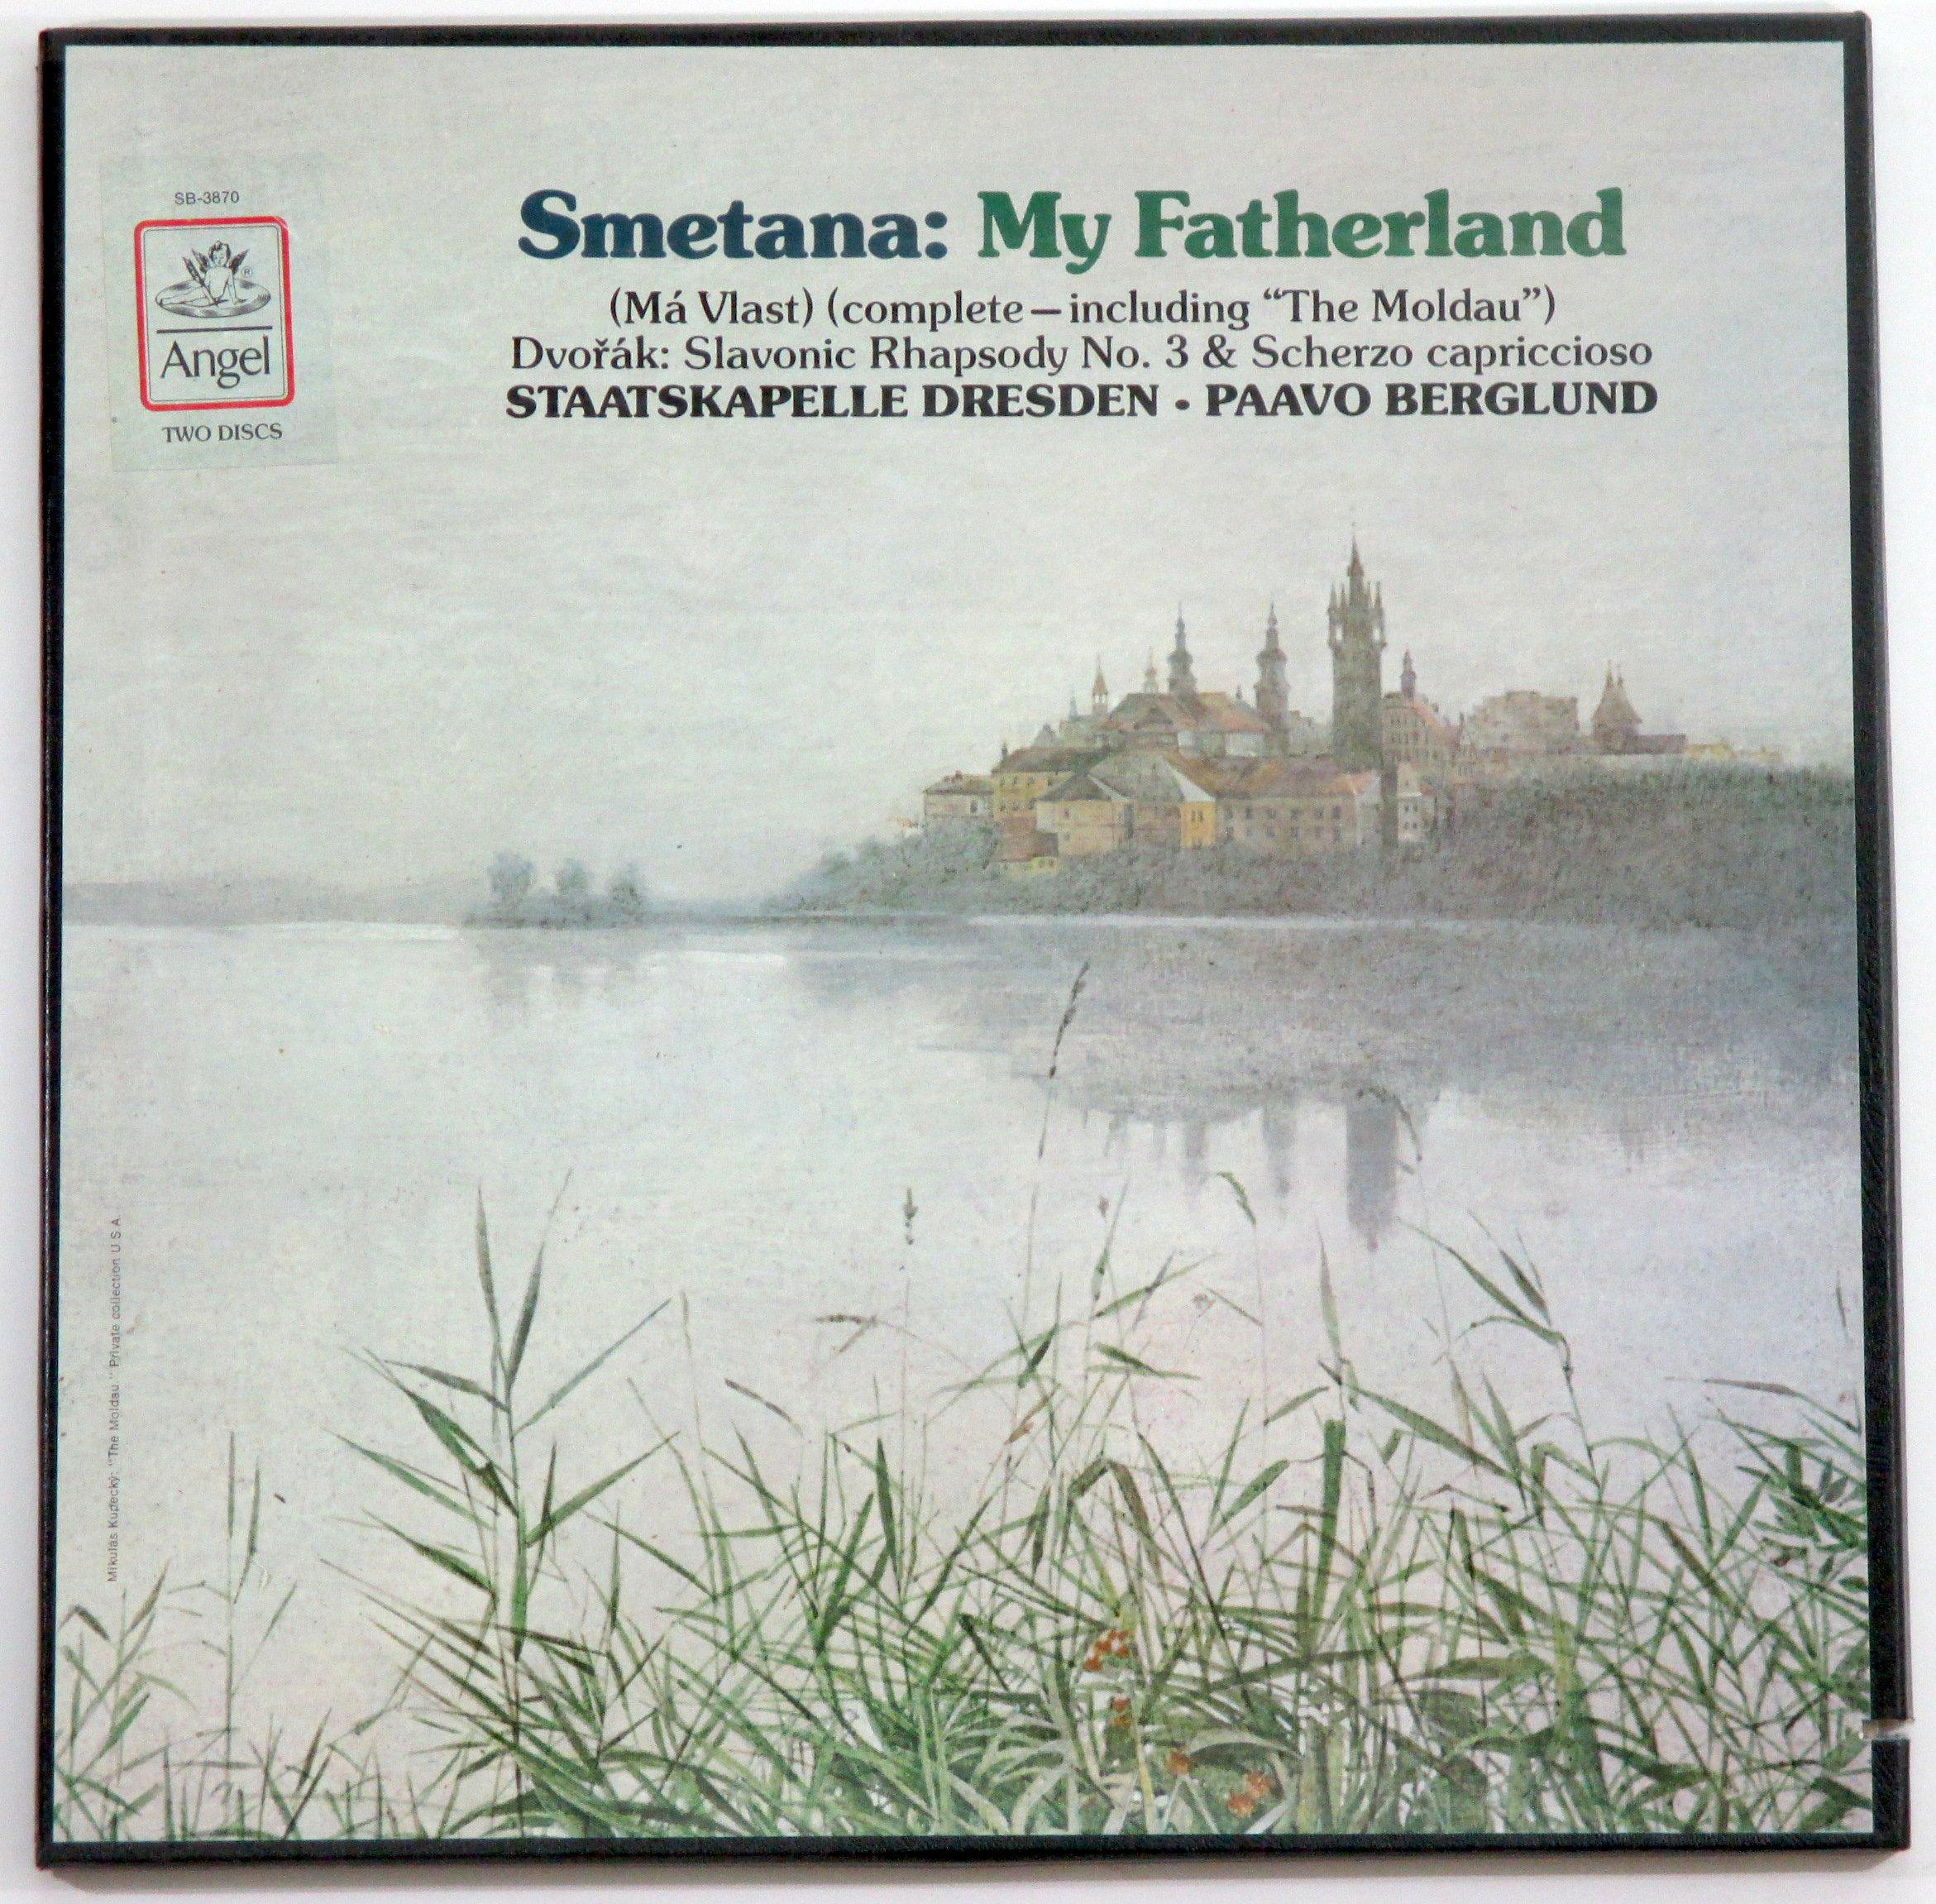 Smetana: My Fatherland (Ma Vlast (Complete - Including ''The Moldau'') / Dvorak: Slavonic Rhapsody No. 3 & Scherzo Capriccioso by Angel SB-3870 Stereo